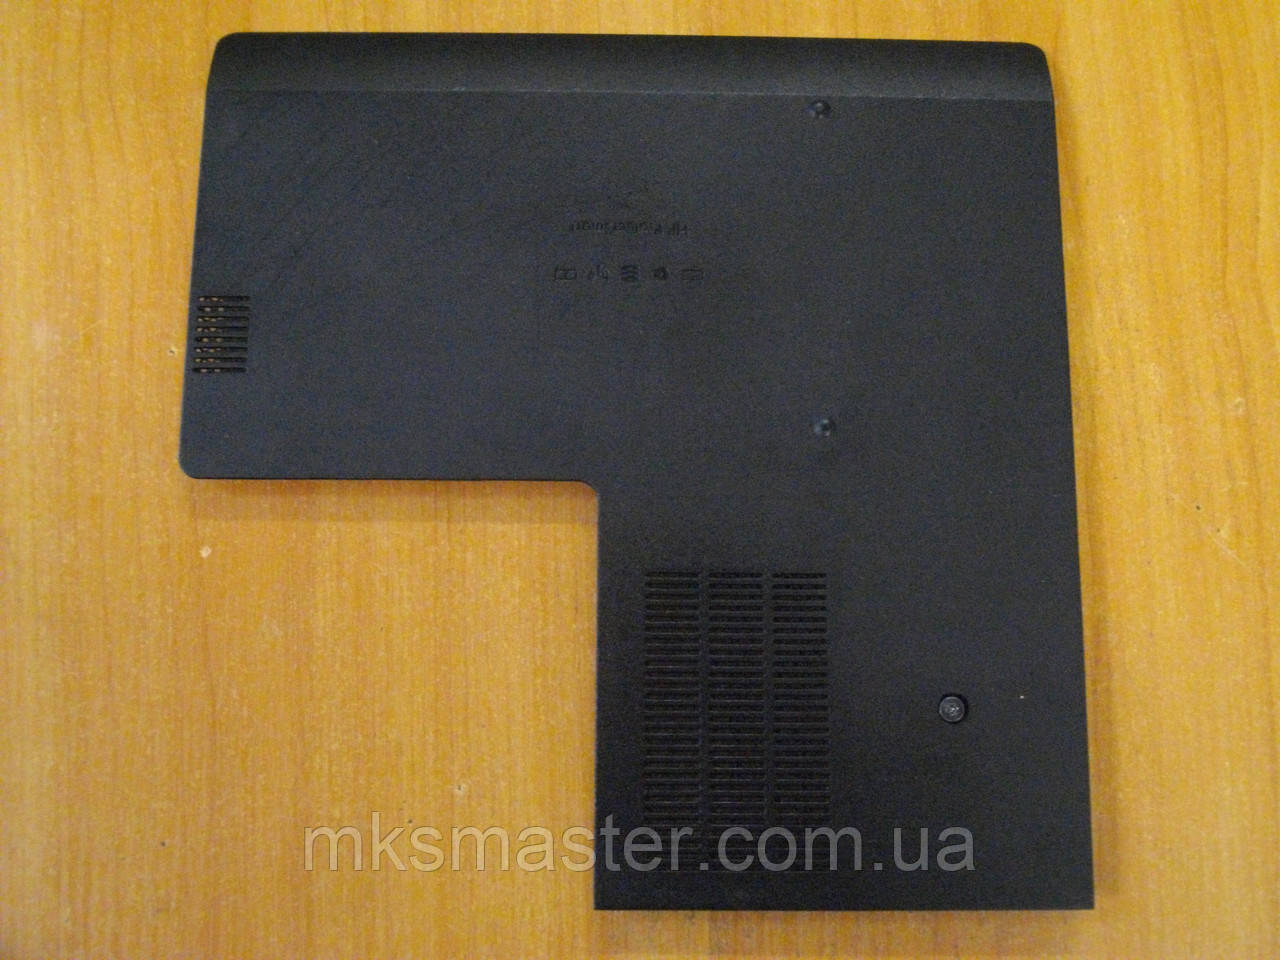 Сервисная Крышка Люк Корпус от ноутбука HP G7-2228er G7-2000 G7-2200 бу